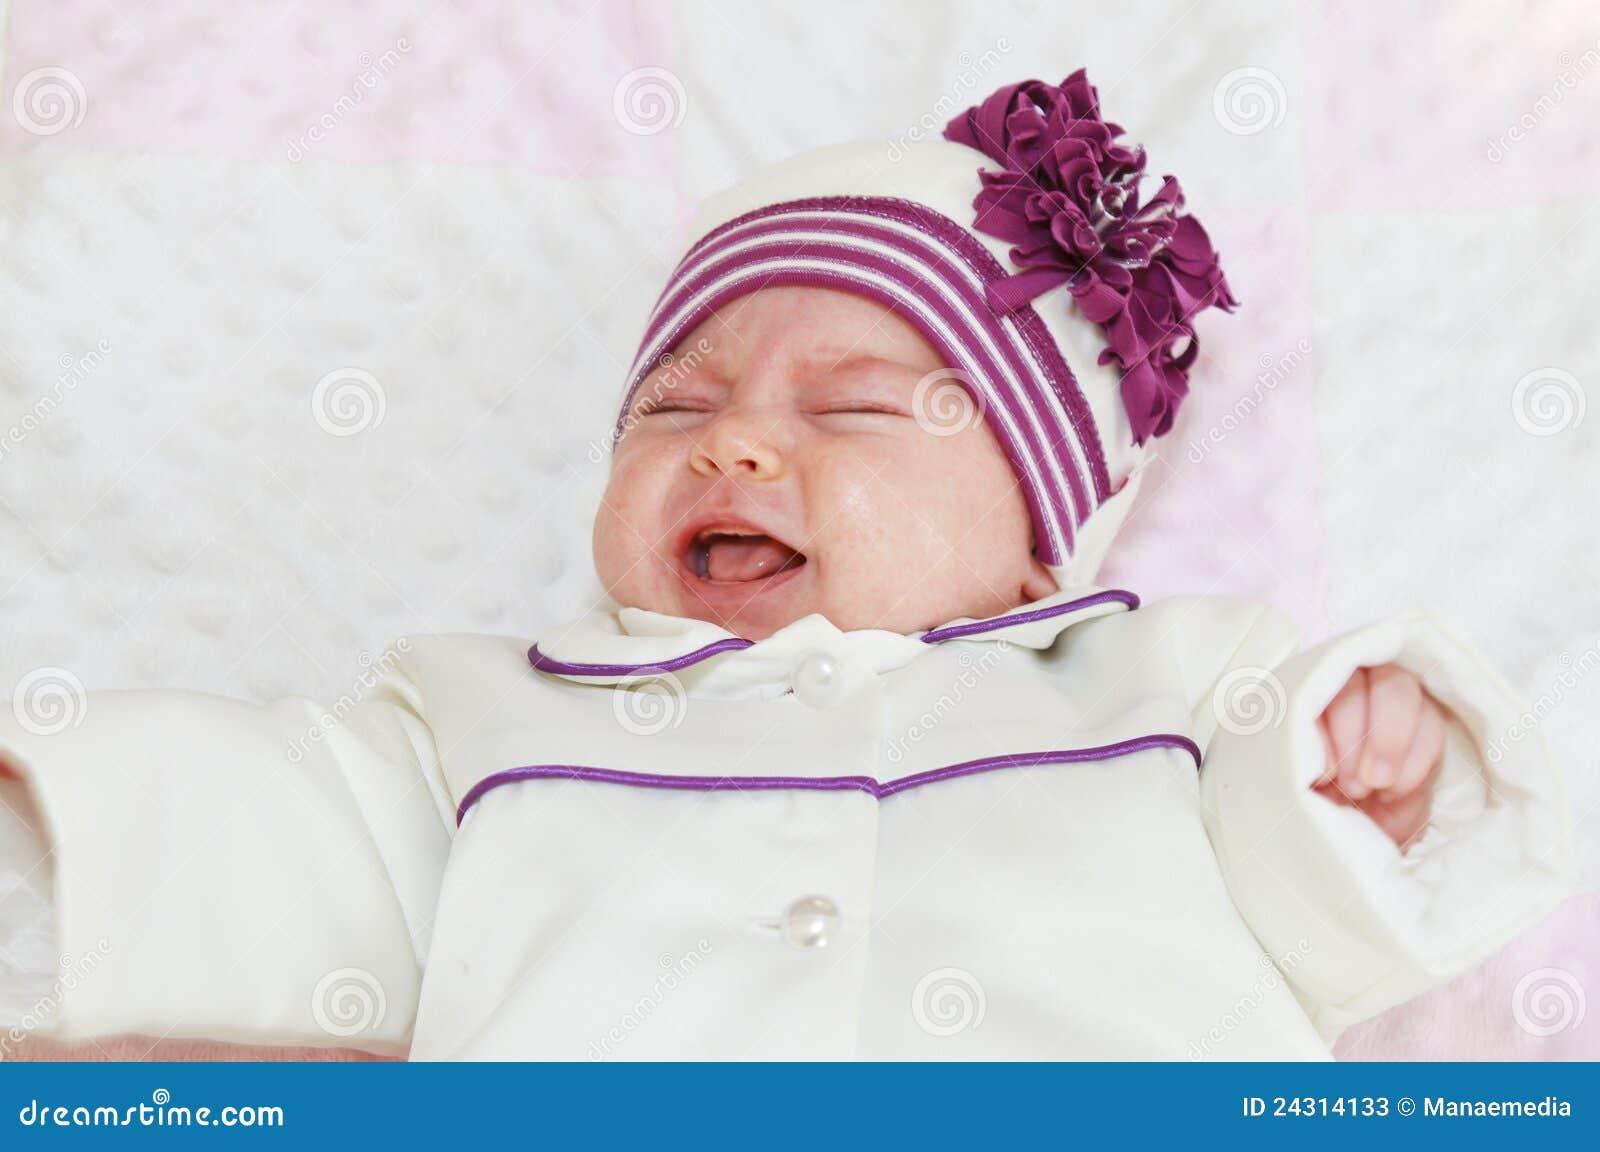 cute baby crying baby crying snot baby crying clip art baby crying ...